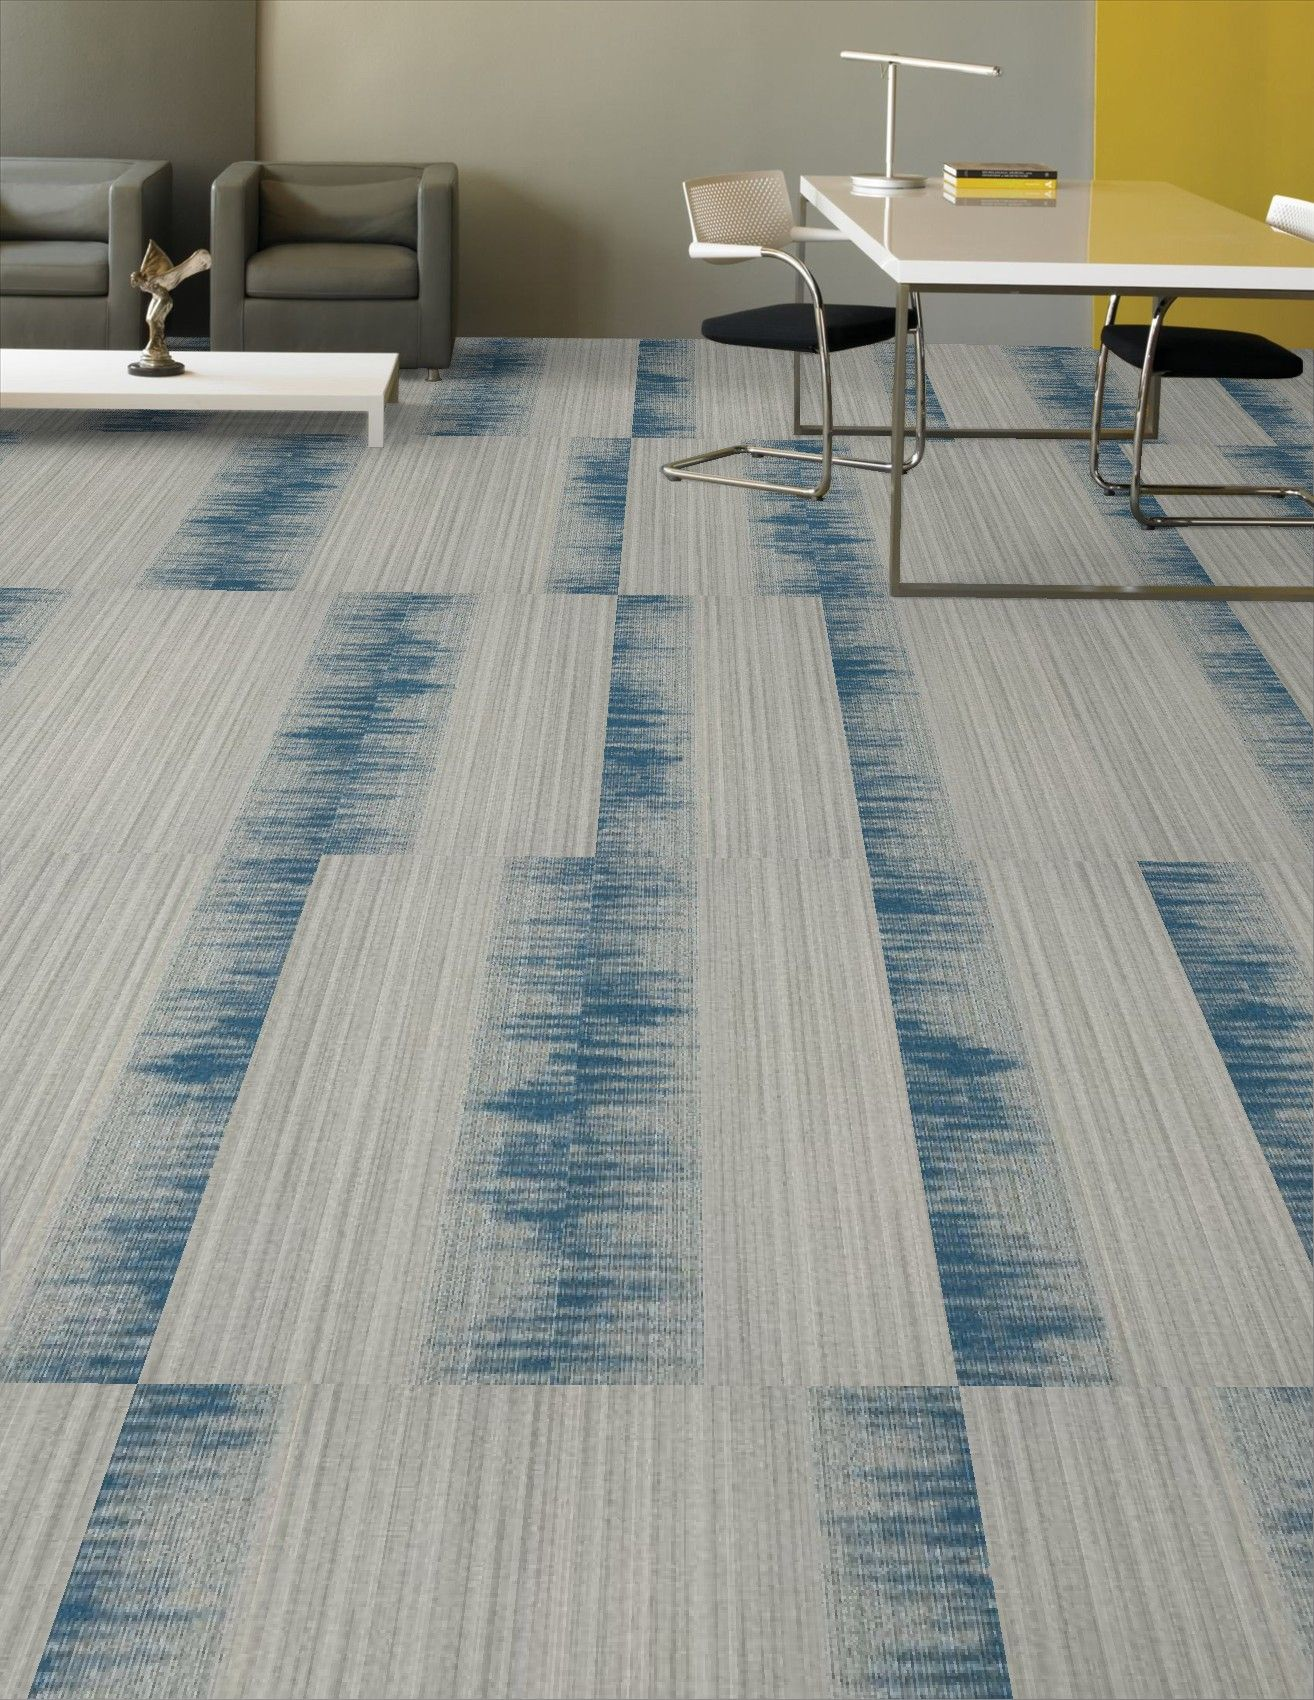 Pin By Duel Design Shop On Hmarq 3100 Flooring Commercial Carpet Carpet Design